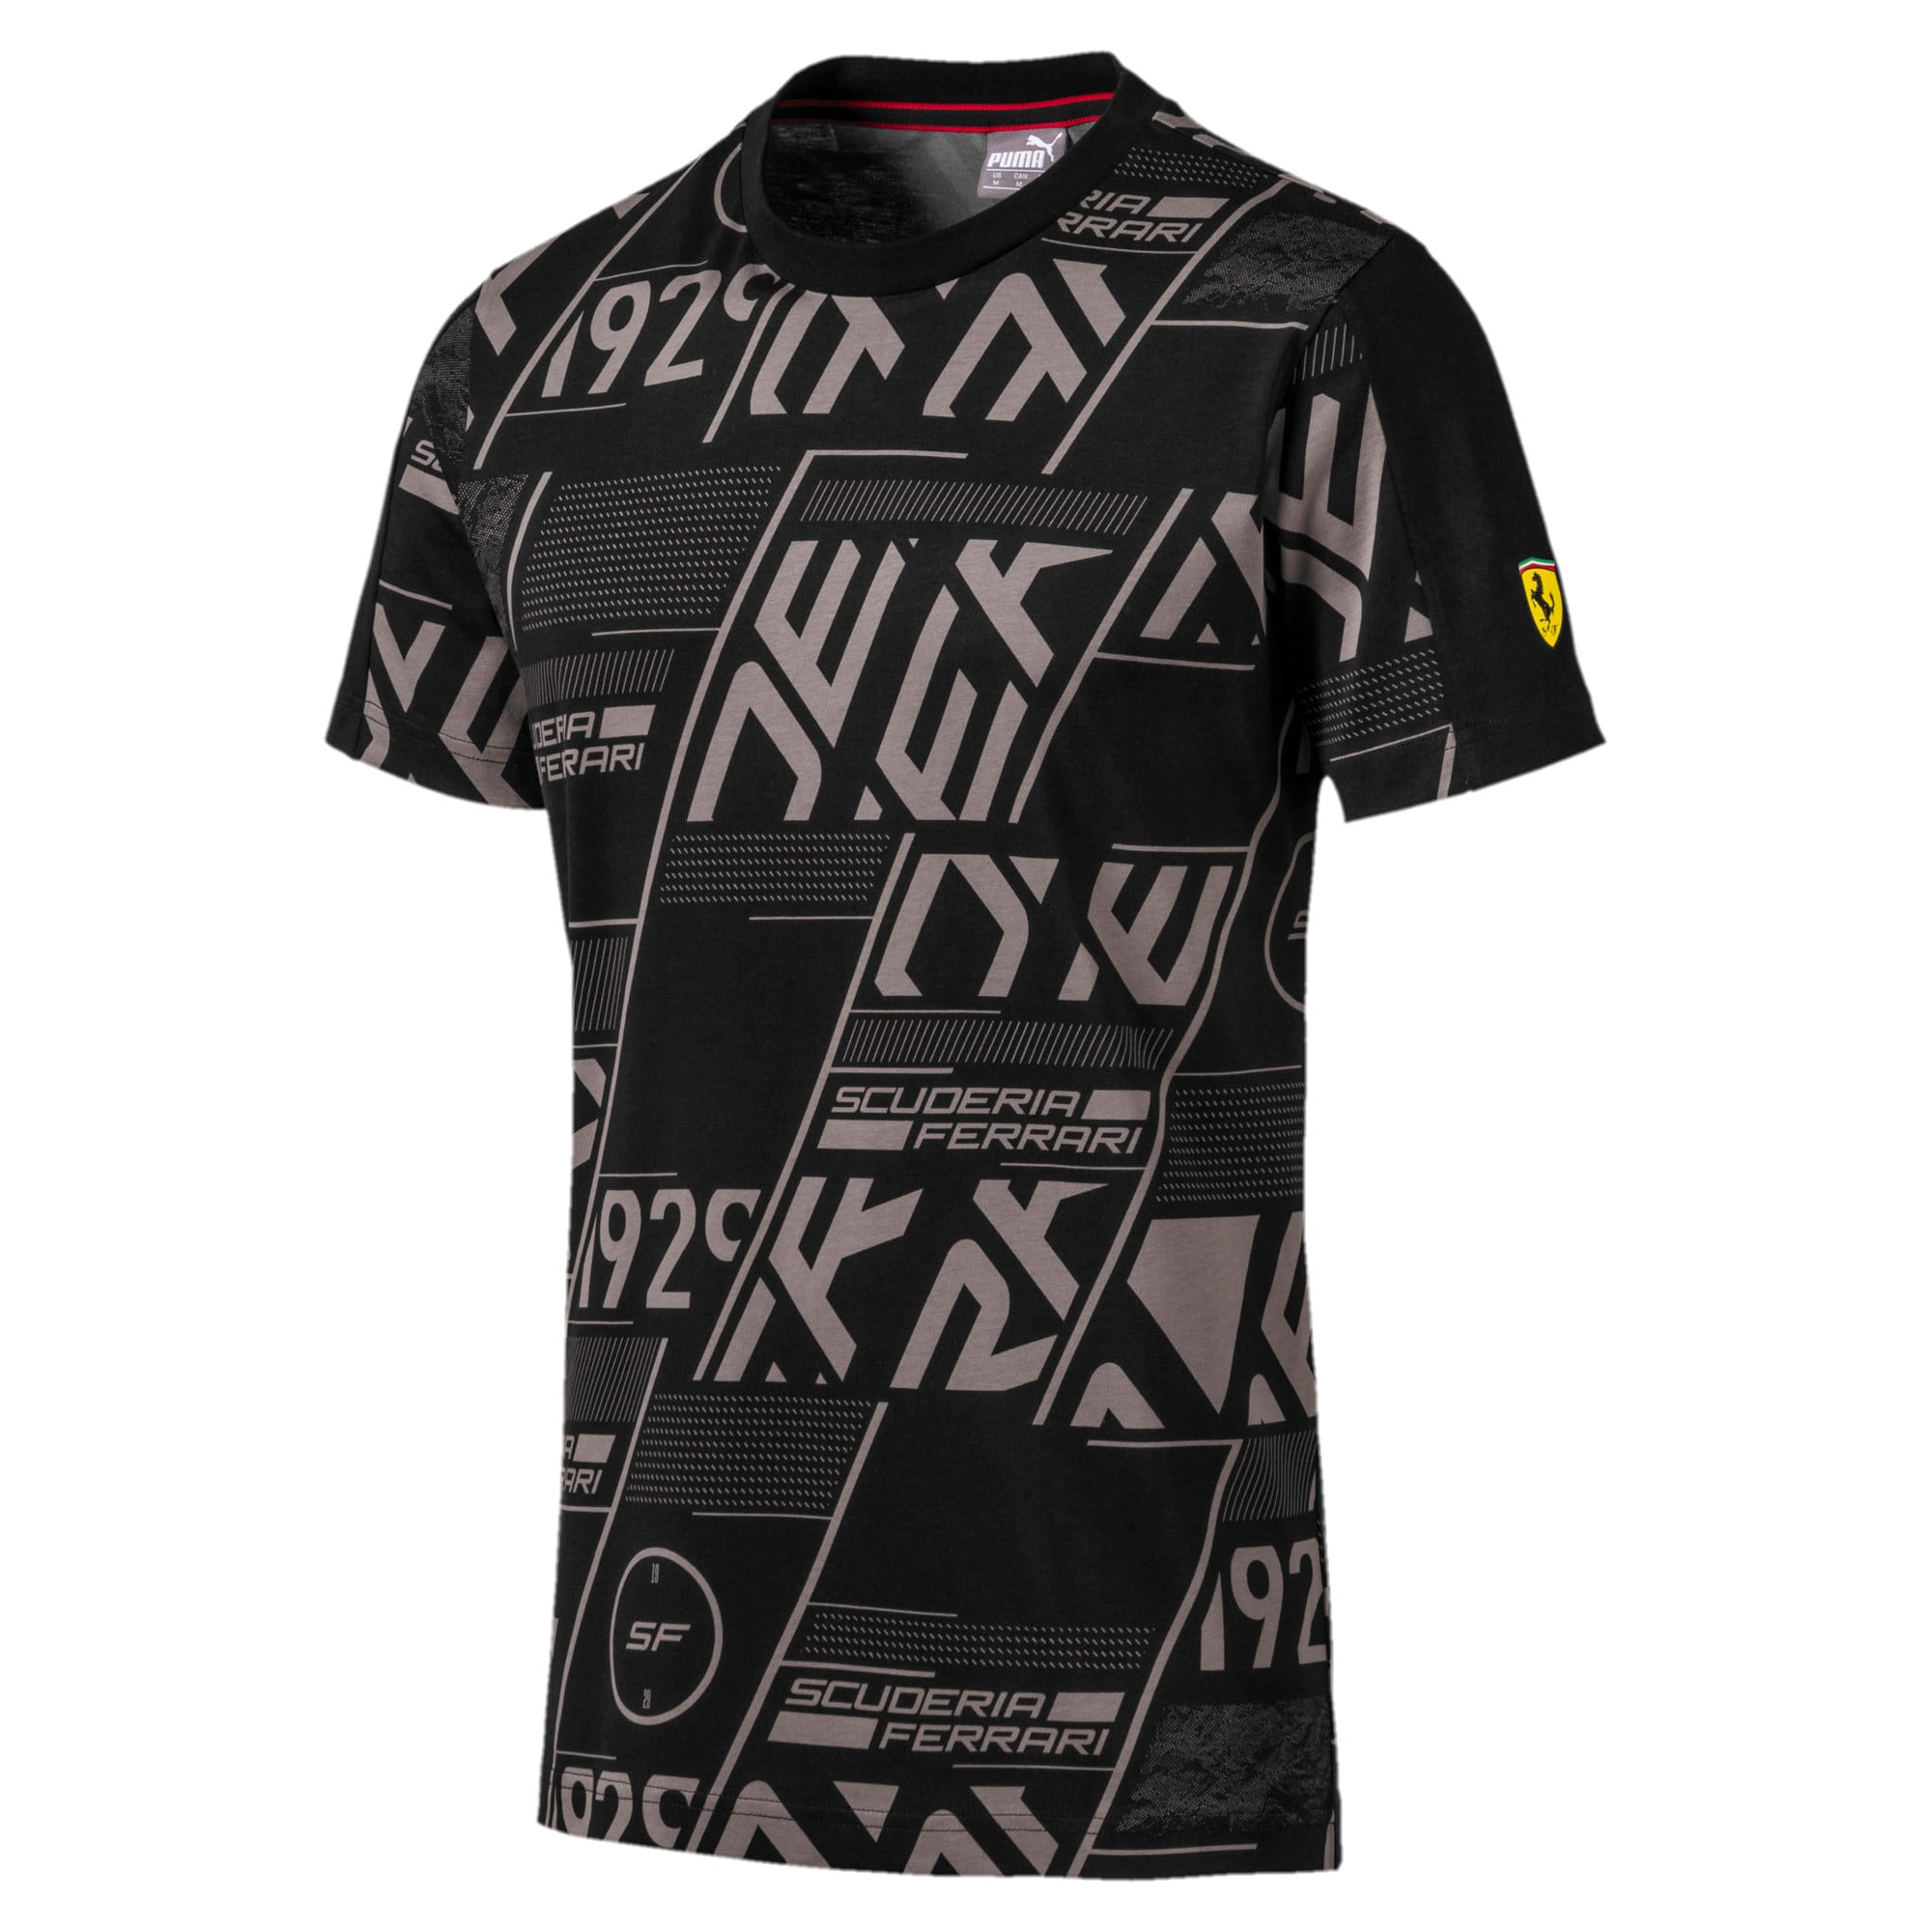 Miniatura 4 de Camiseta Scuderia Ferrari AOP para hombre, Puma Black, mediano